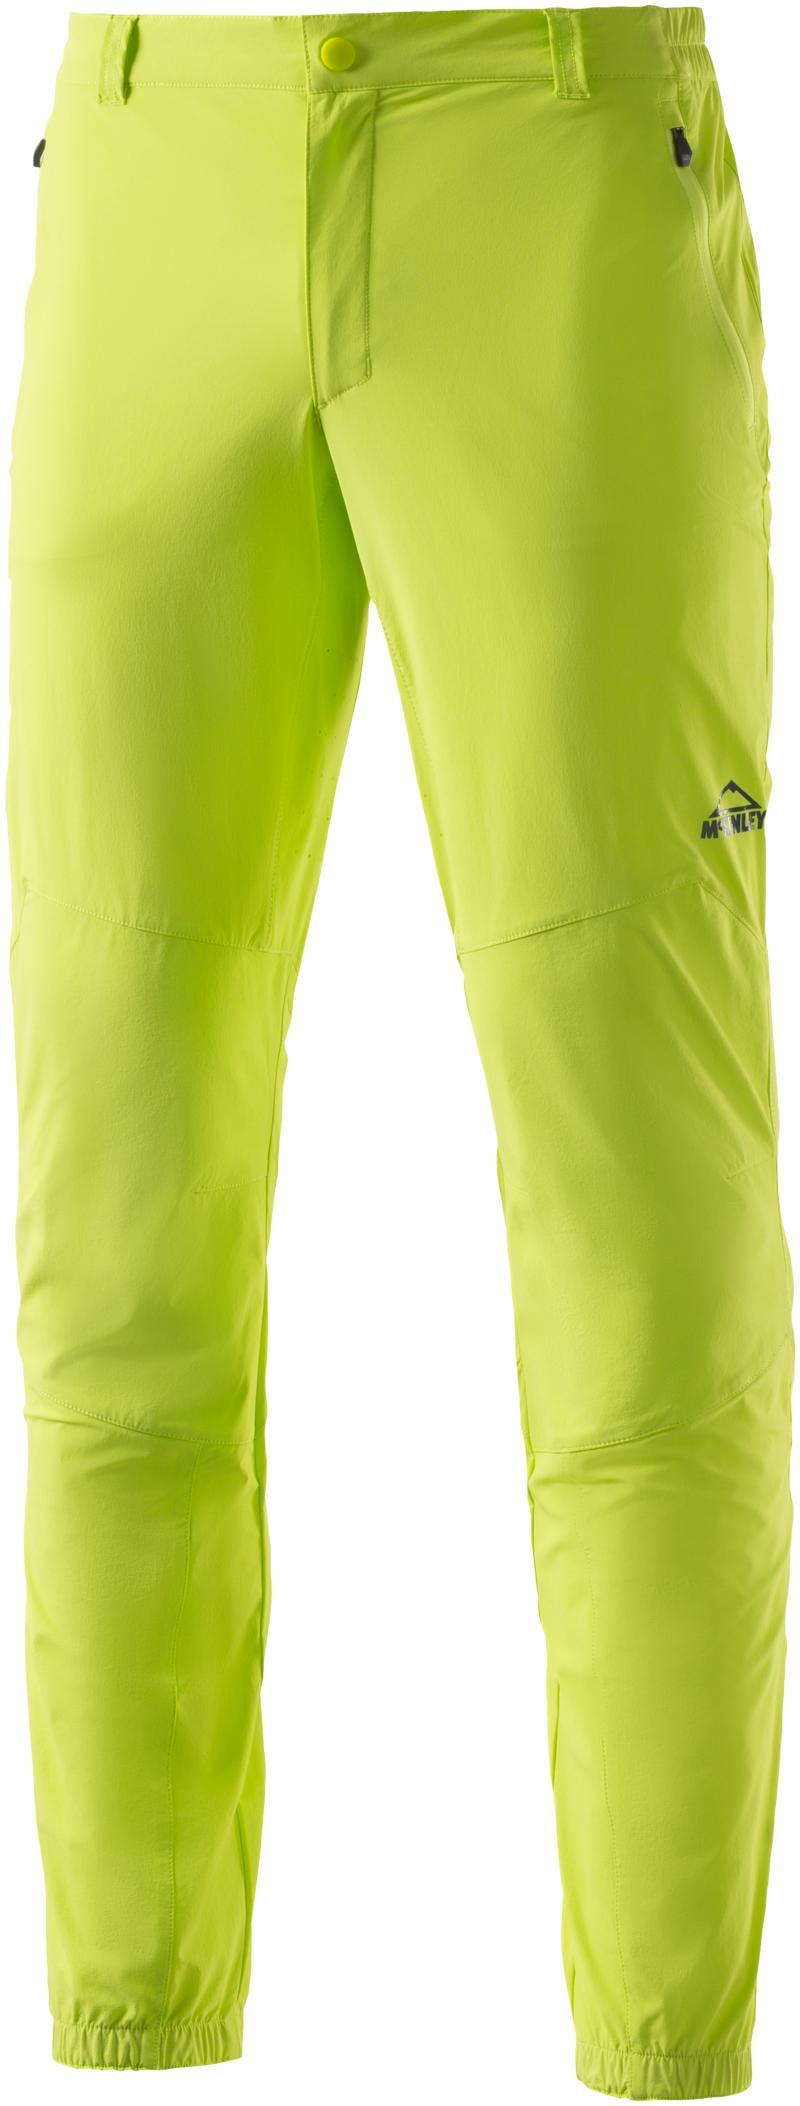 McKinley BEIRA LT, muške pantalone za planinarenje, zelena